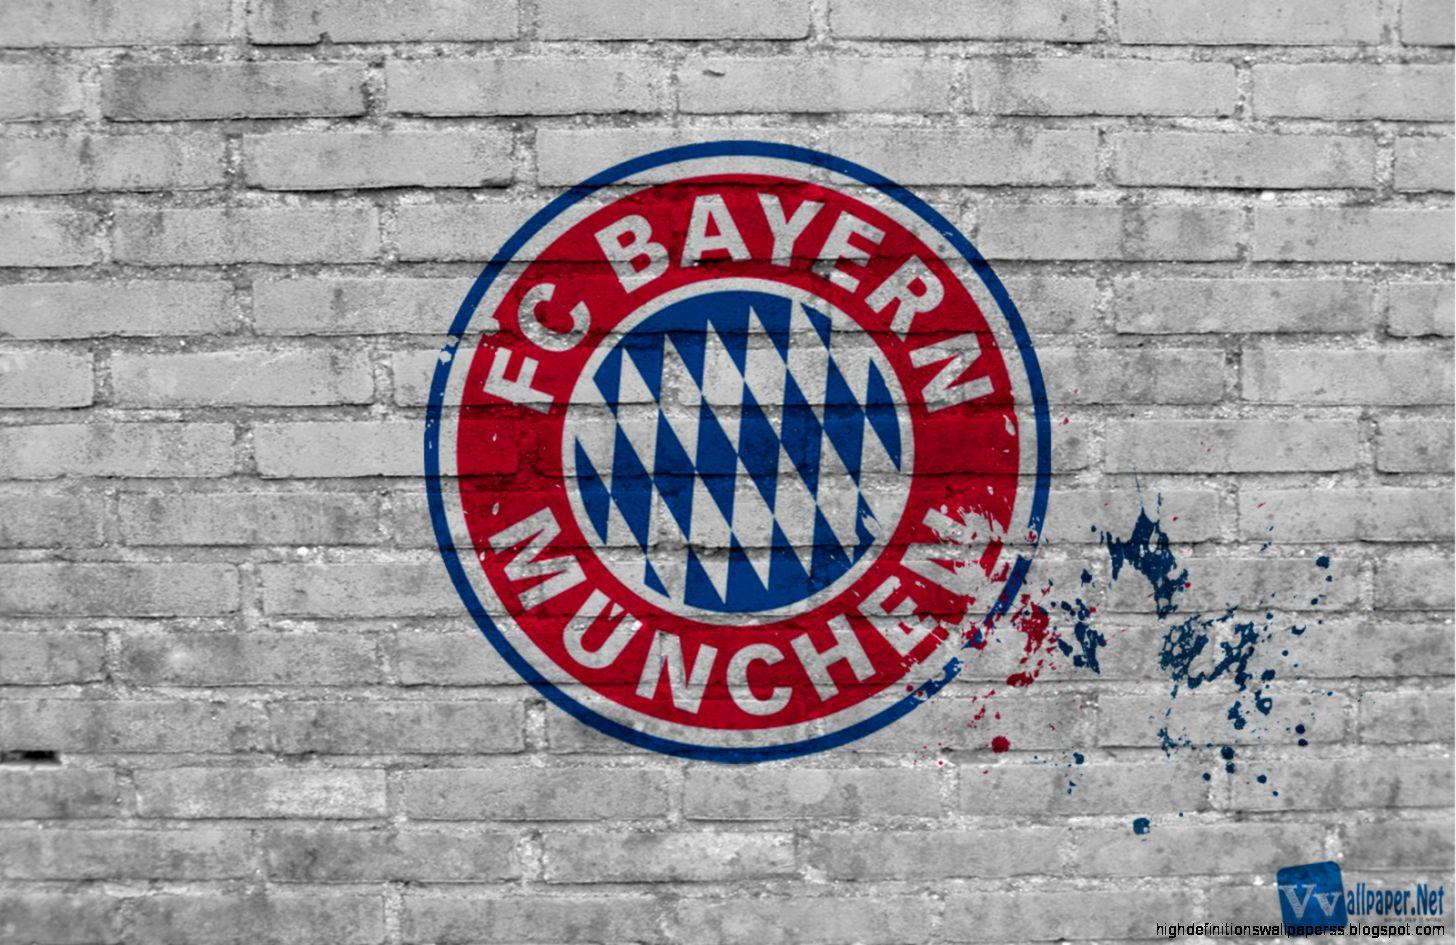 Fc bayern munchen logo sport hd wallpaper desktop high view original size bayern munich hd wallpaper bayern munich voltagebd Image collections